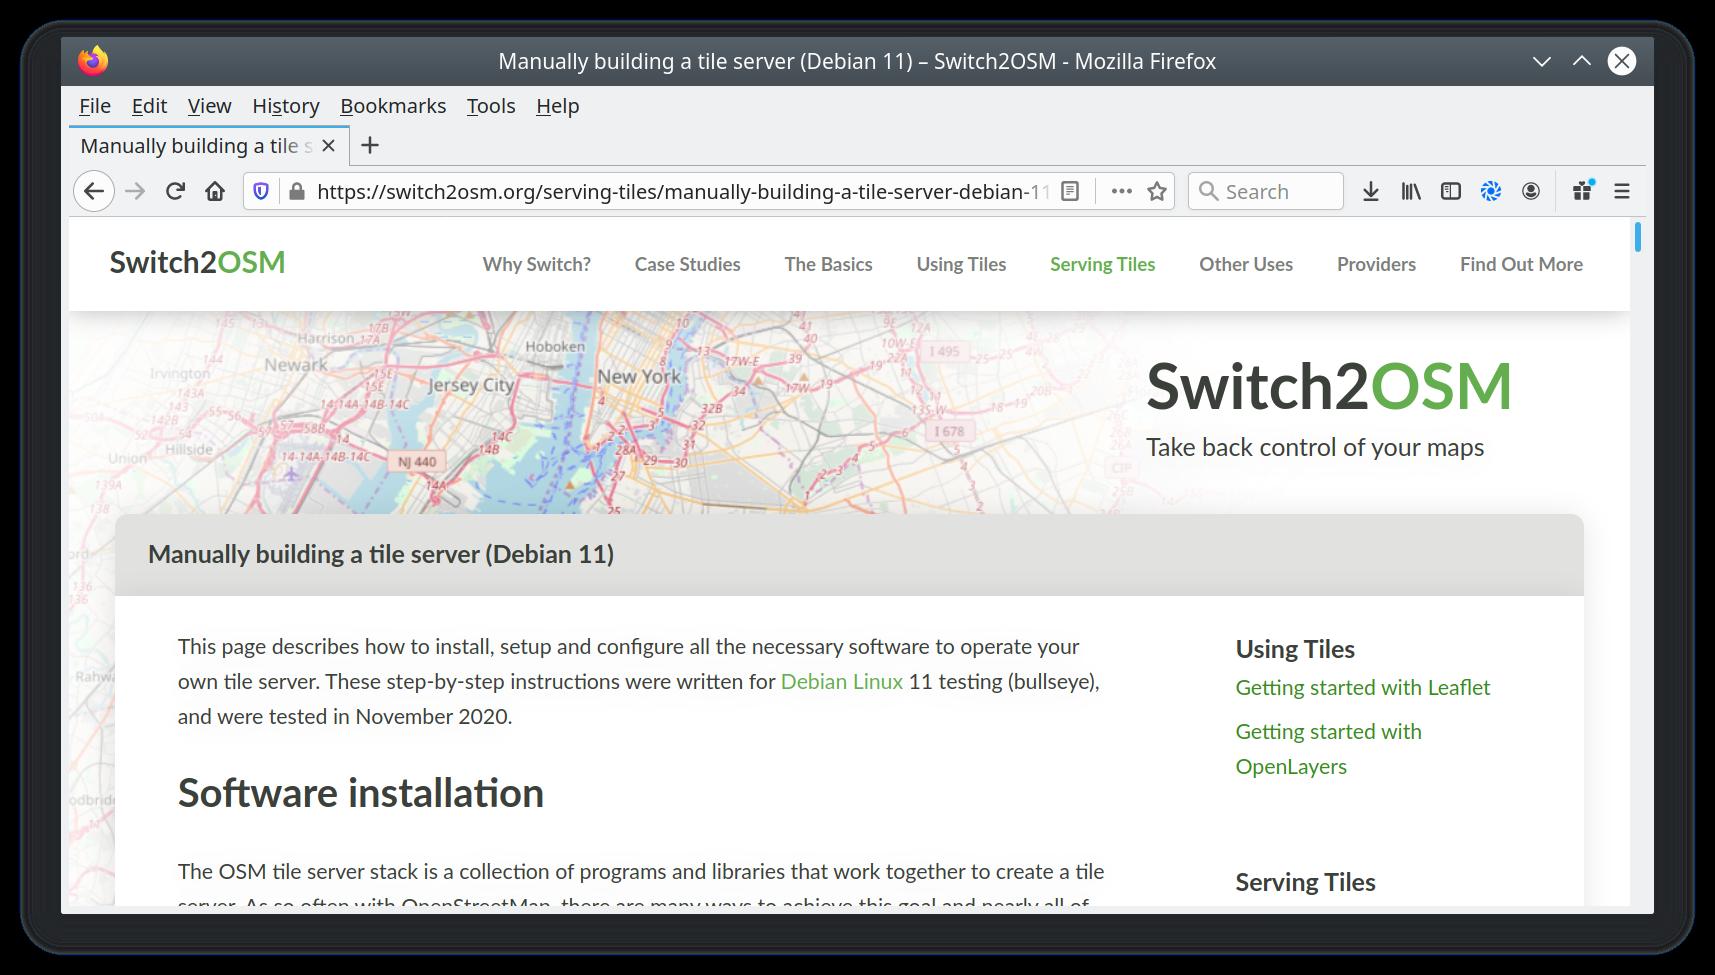 Screenshot of switch2osm page